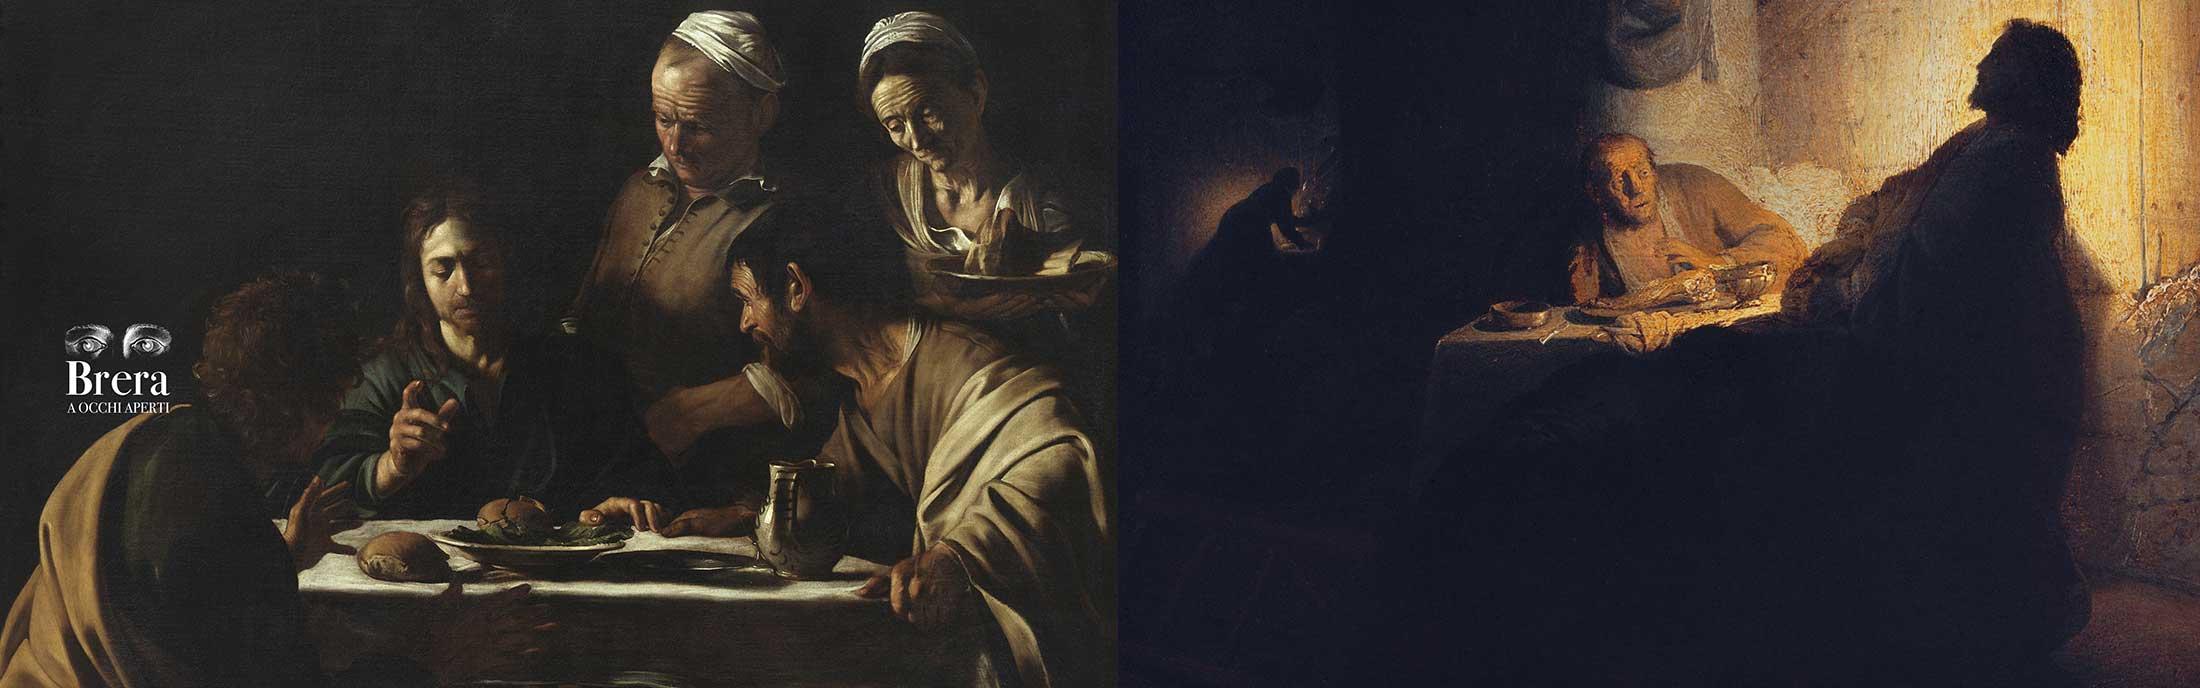 Ottavo dialogo<br><em>Attorno alla Cena in Emmaus.<br>Caravaggio incontra Rembrandt</em>